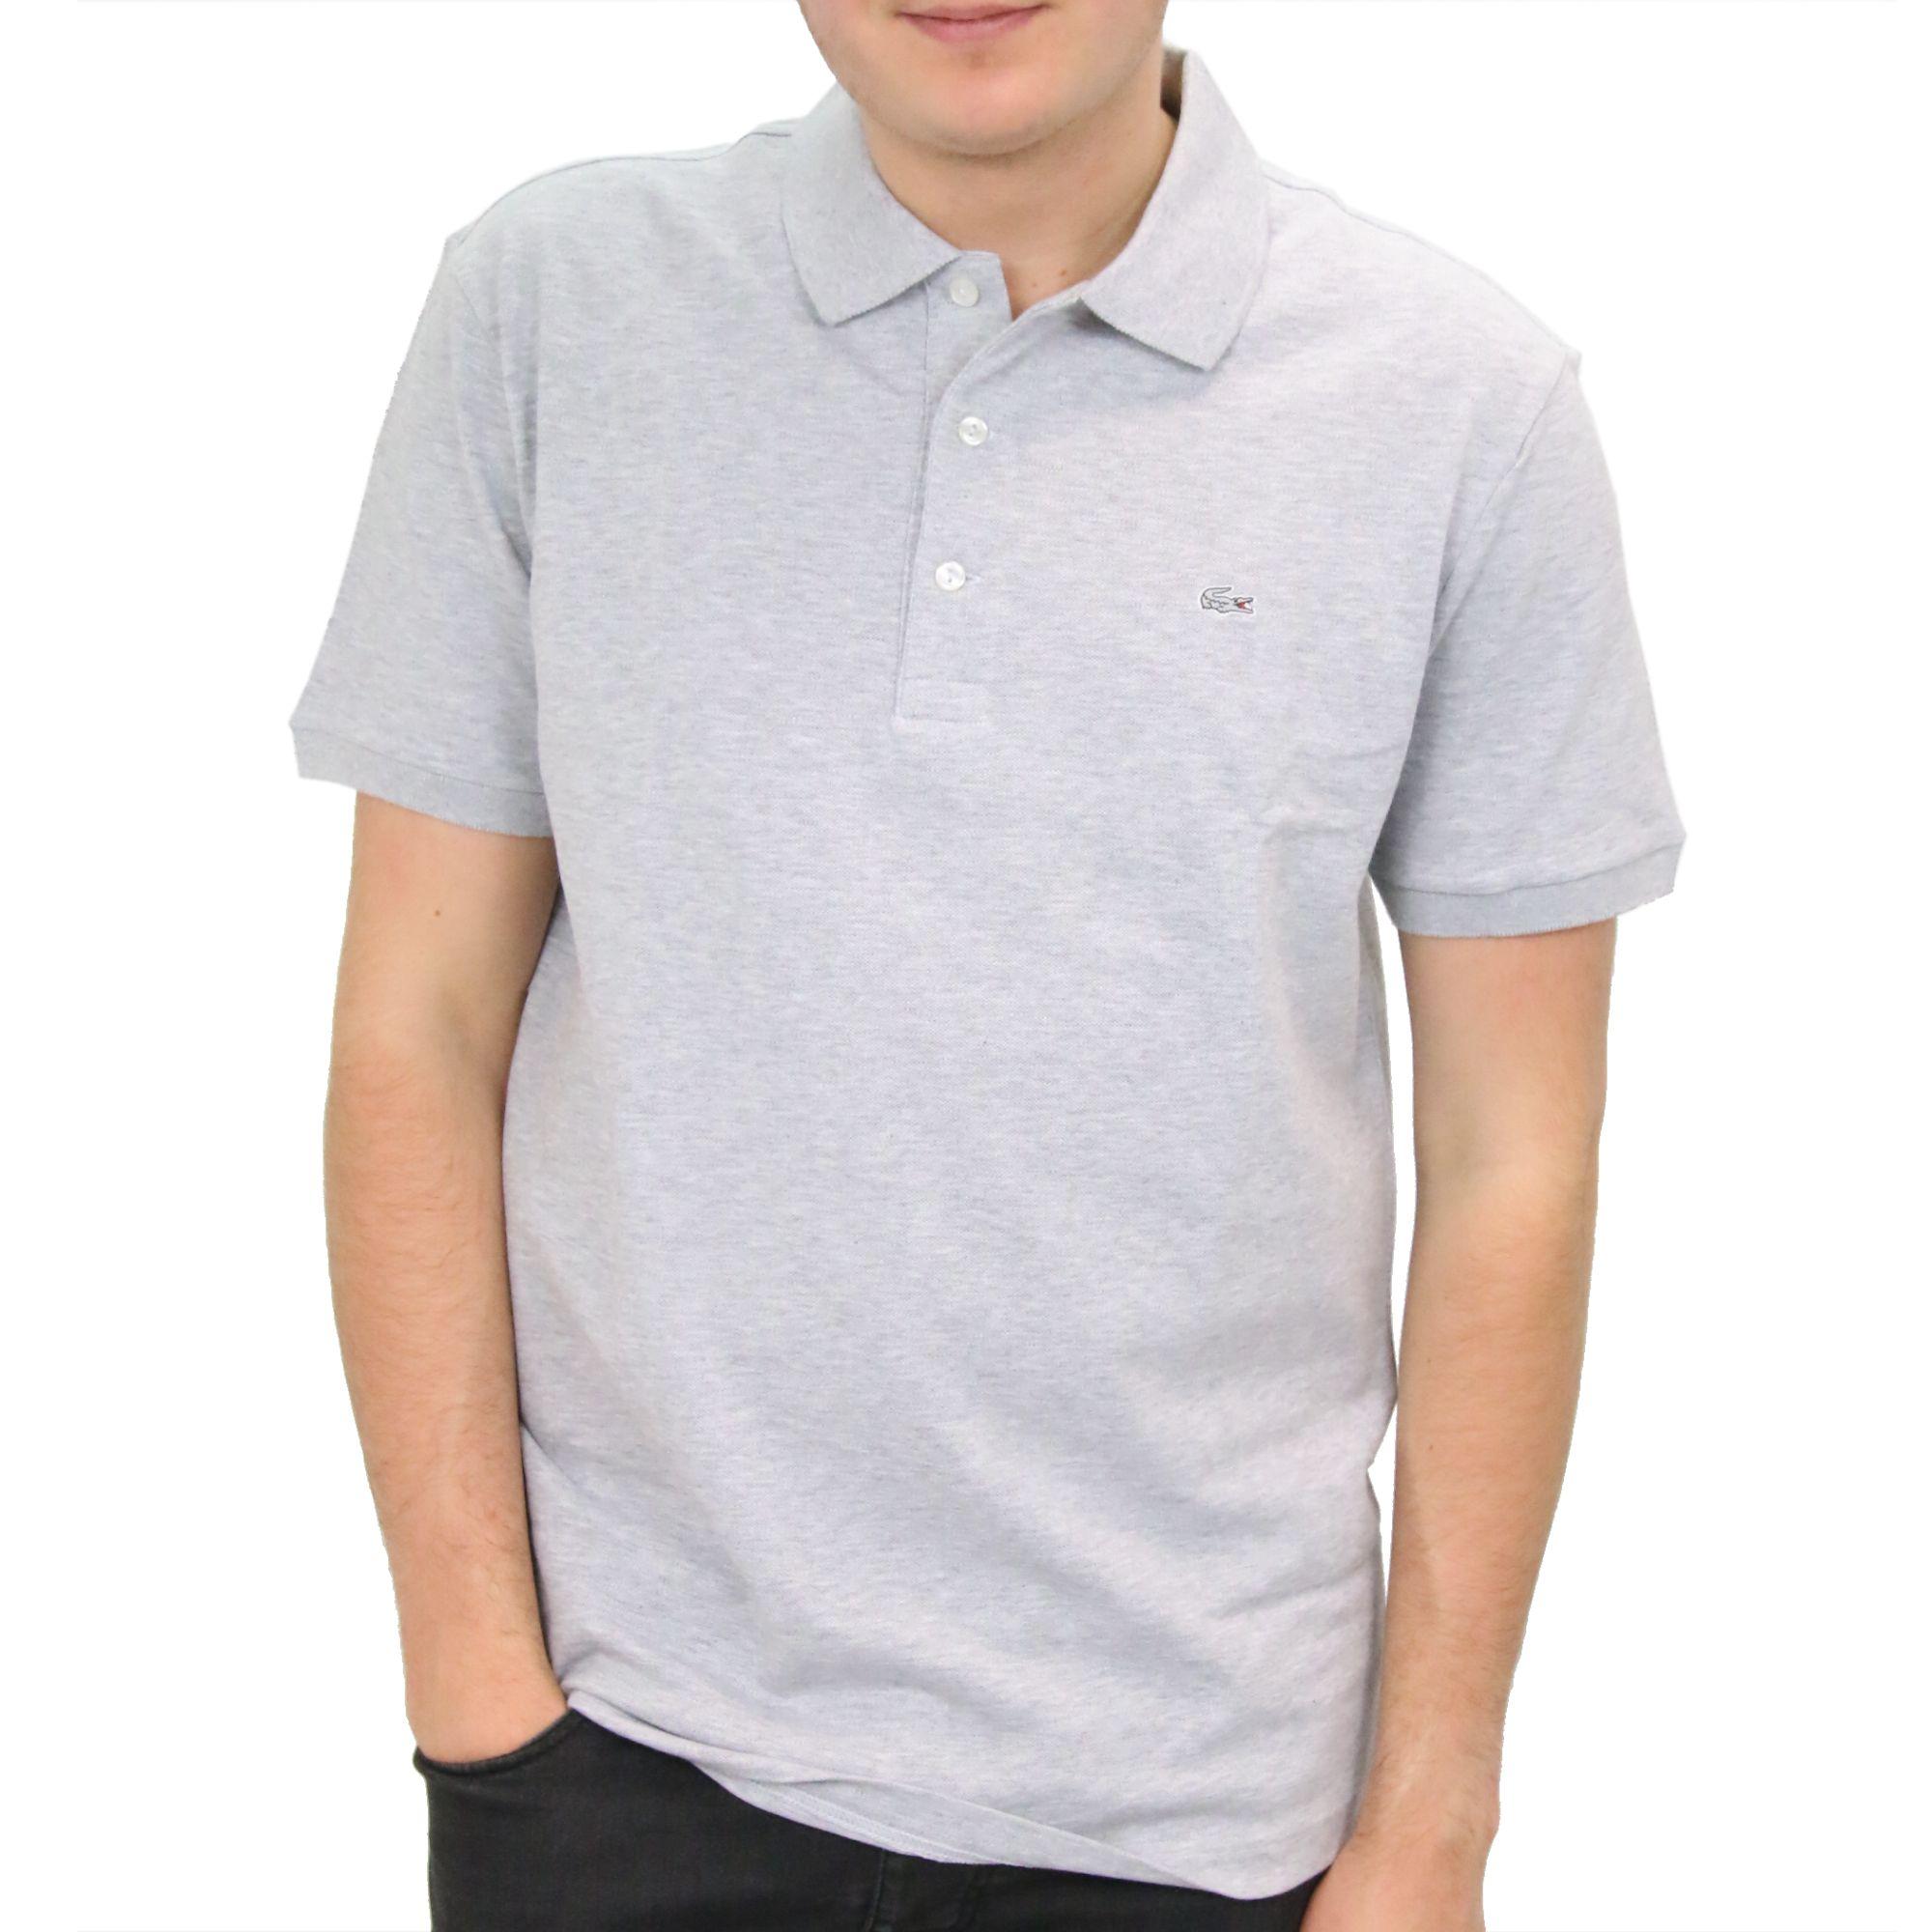 super popular b9b56 dc8eb Details zu Lacoste Polo Slim Fit Poloshirt Polohemd T-Shirt Kurzarm Herren  PH4014 CCA Grau